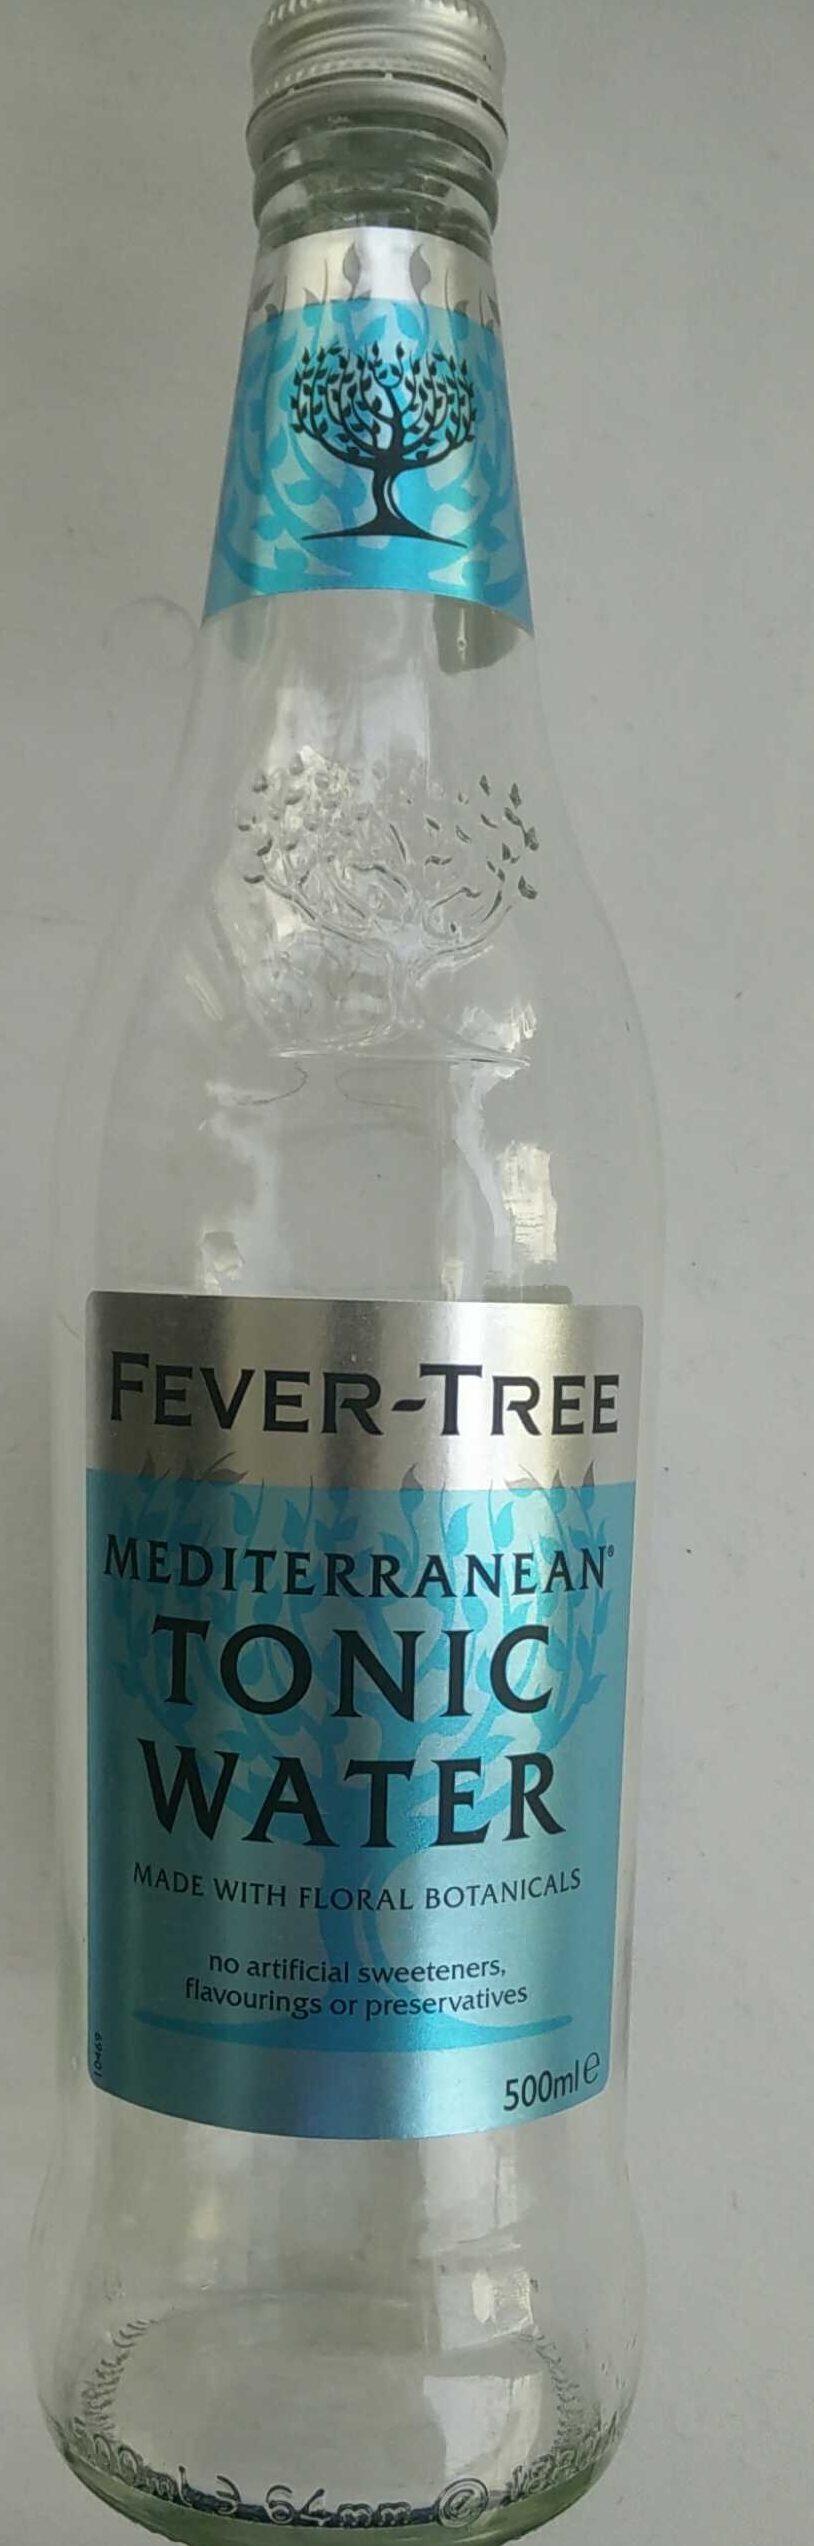 Mediterranean Tonic Water - Produit - en